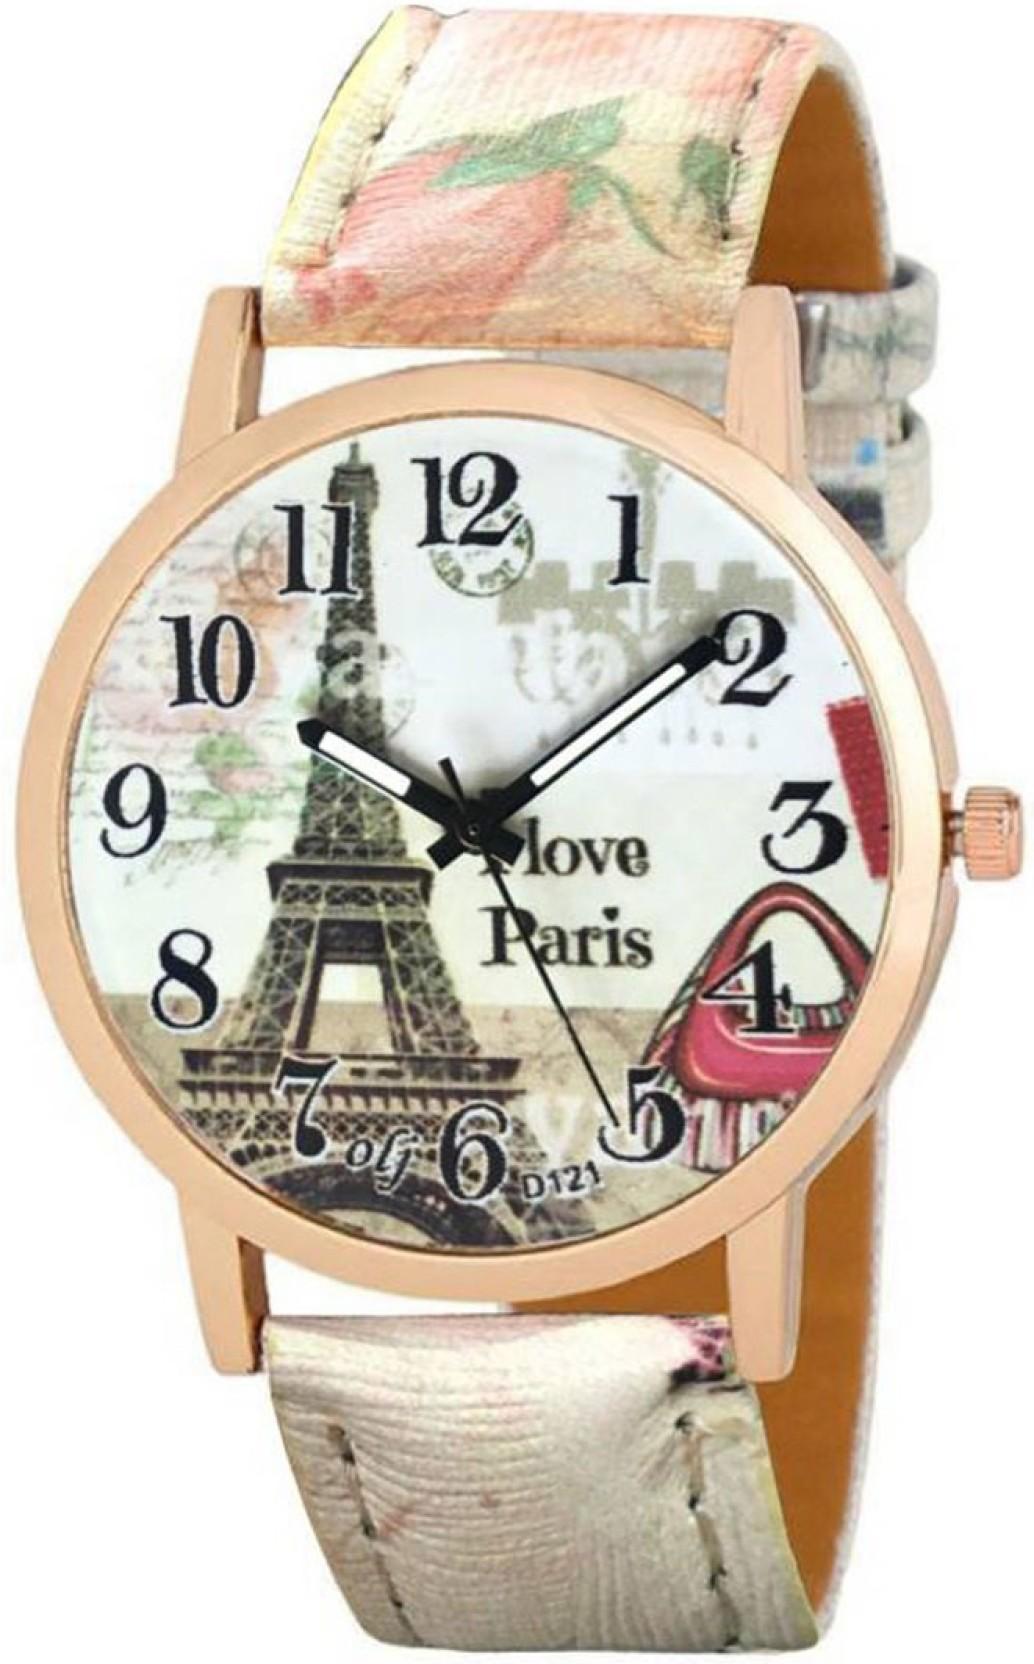 Frida analogue stylish designer watches for girls and women paris ...